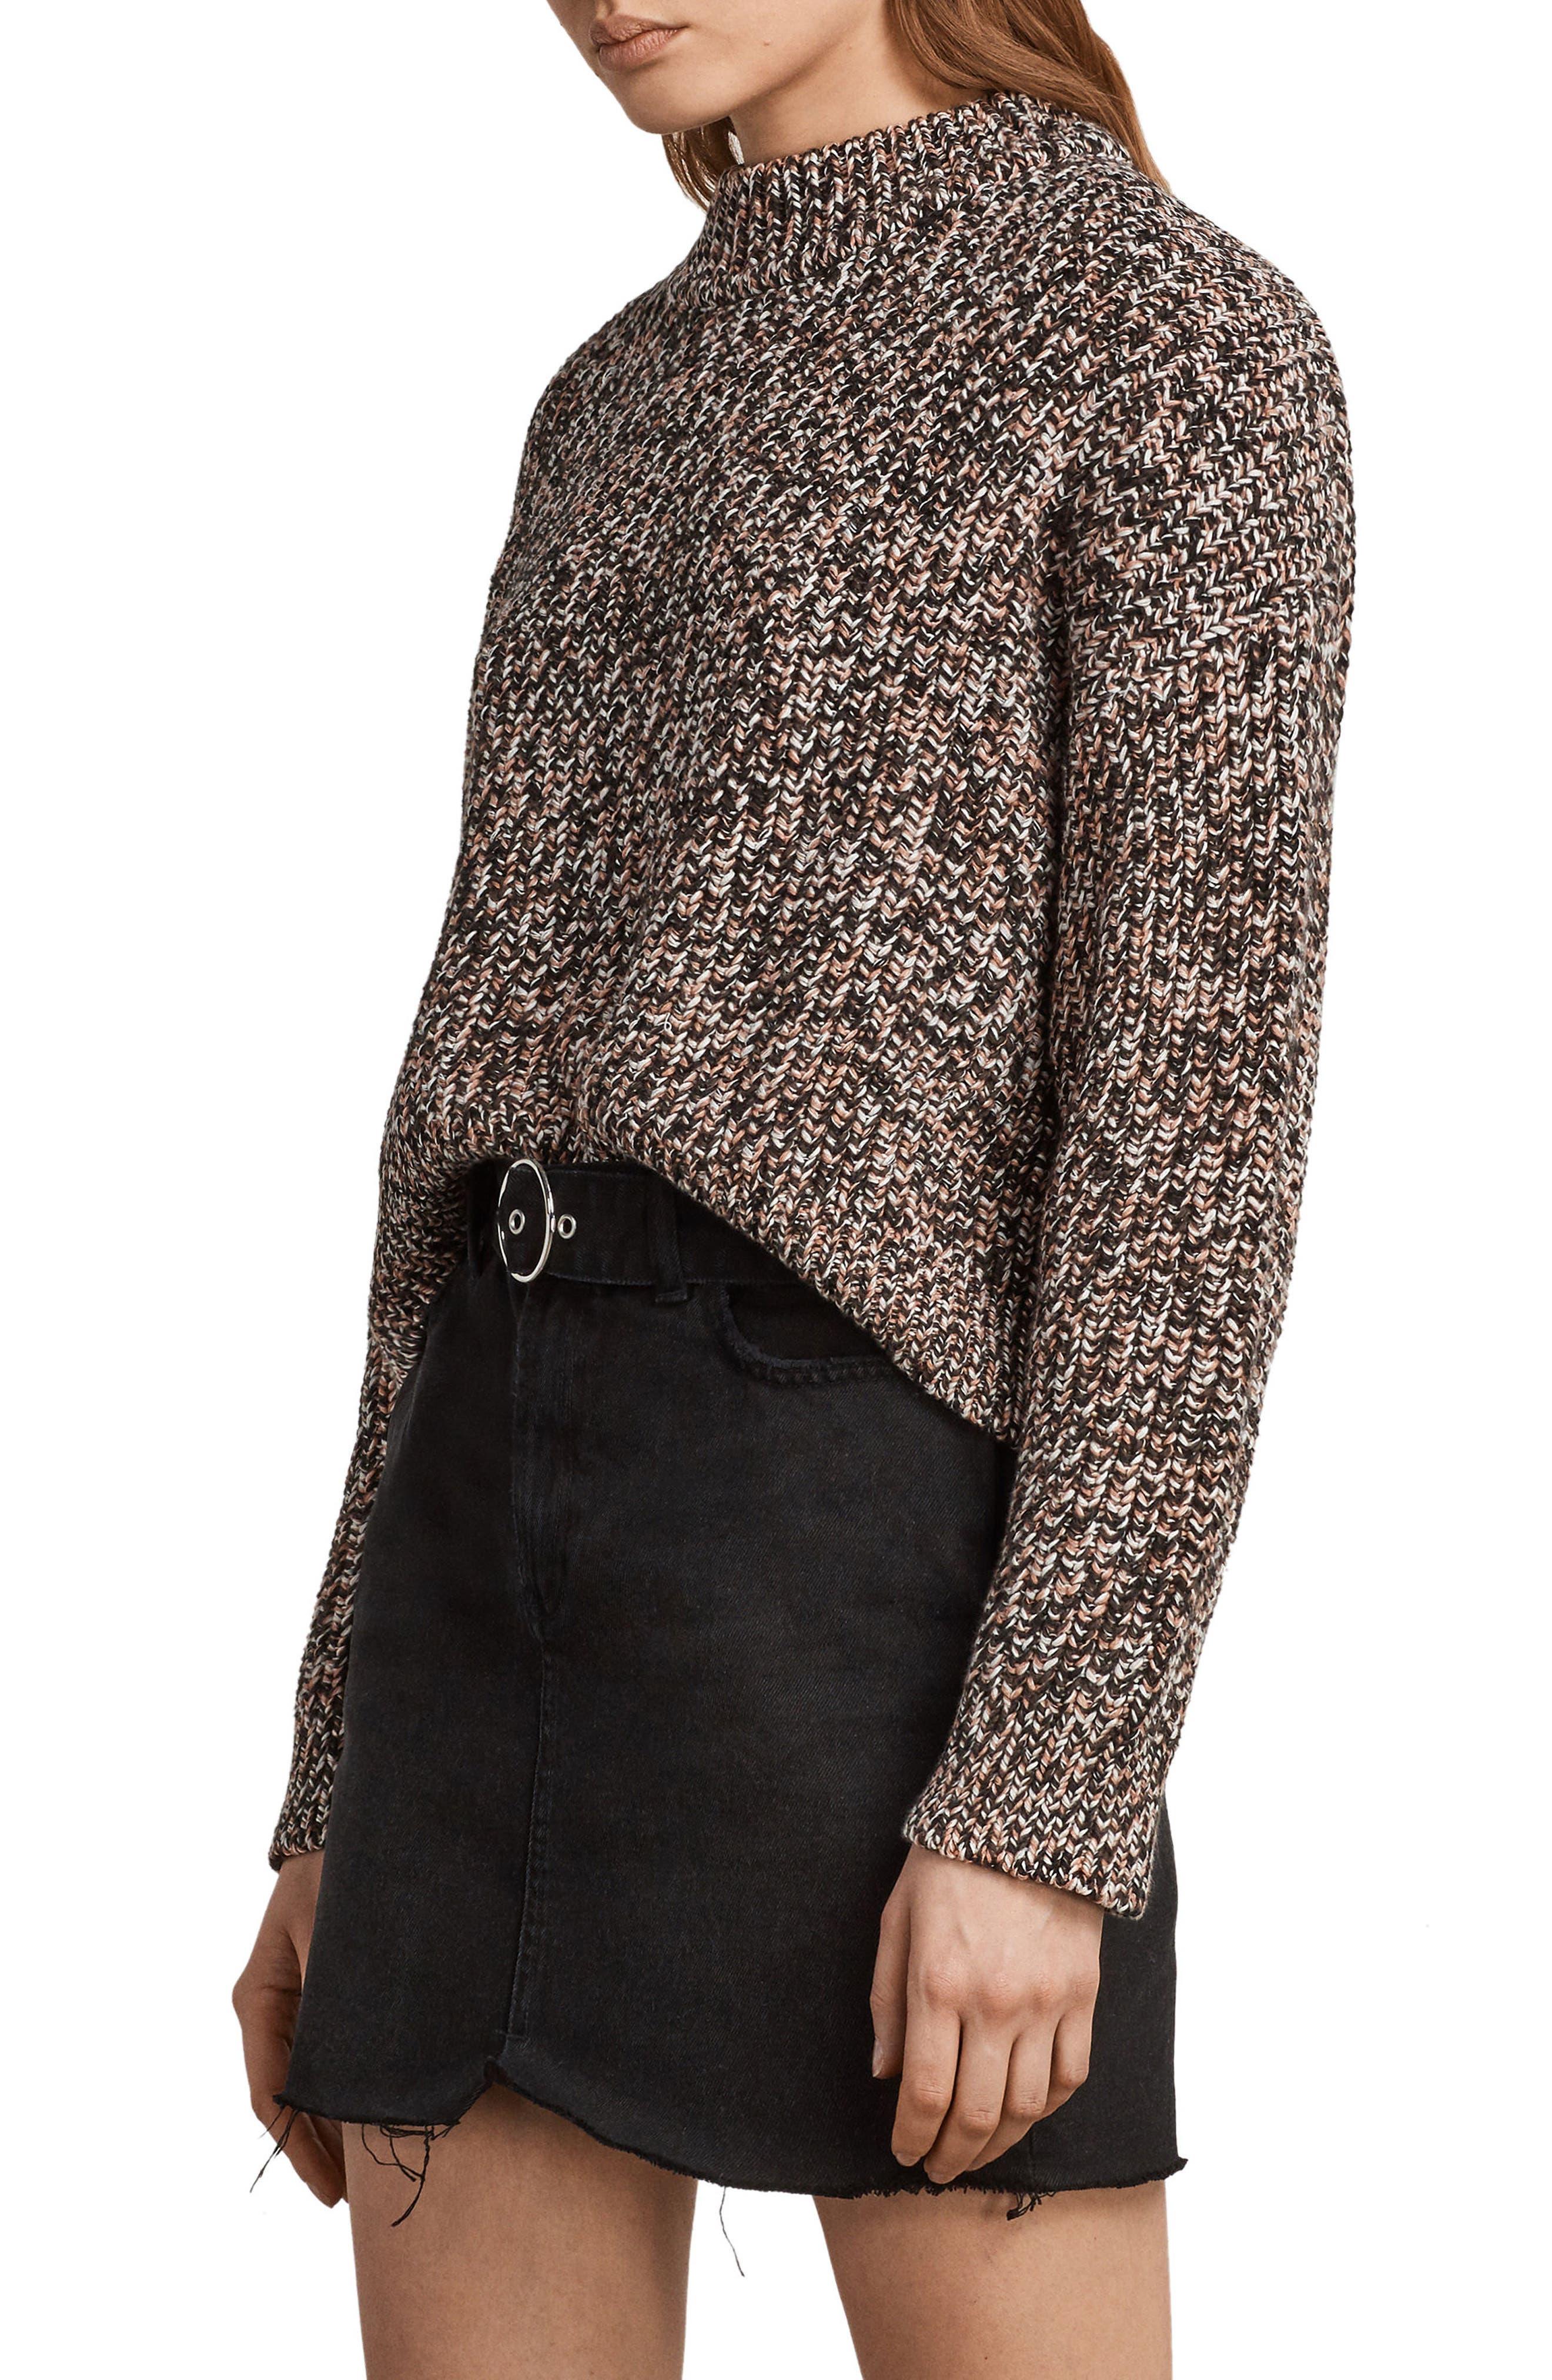 Malu Knit Sweater,                             Alternate thumbnail 3, color,                             690